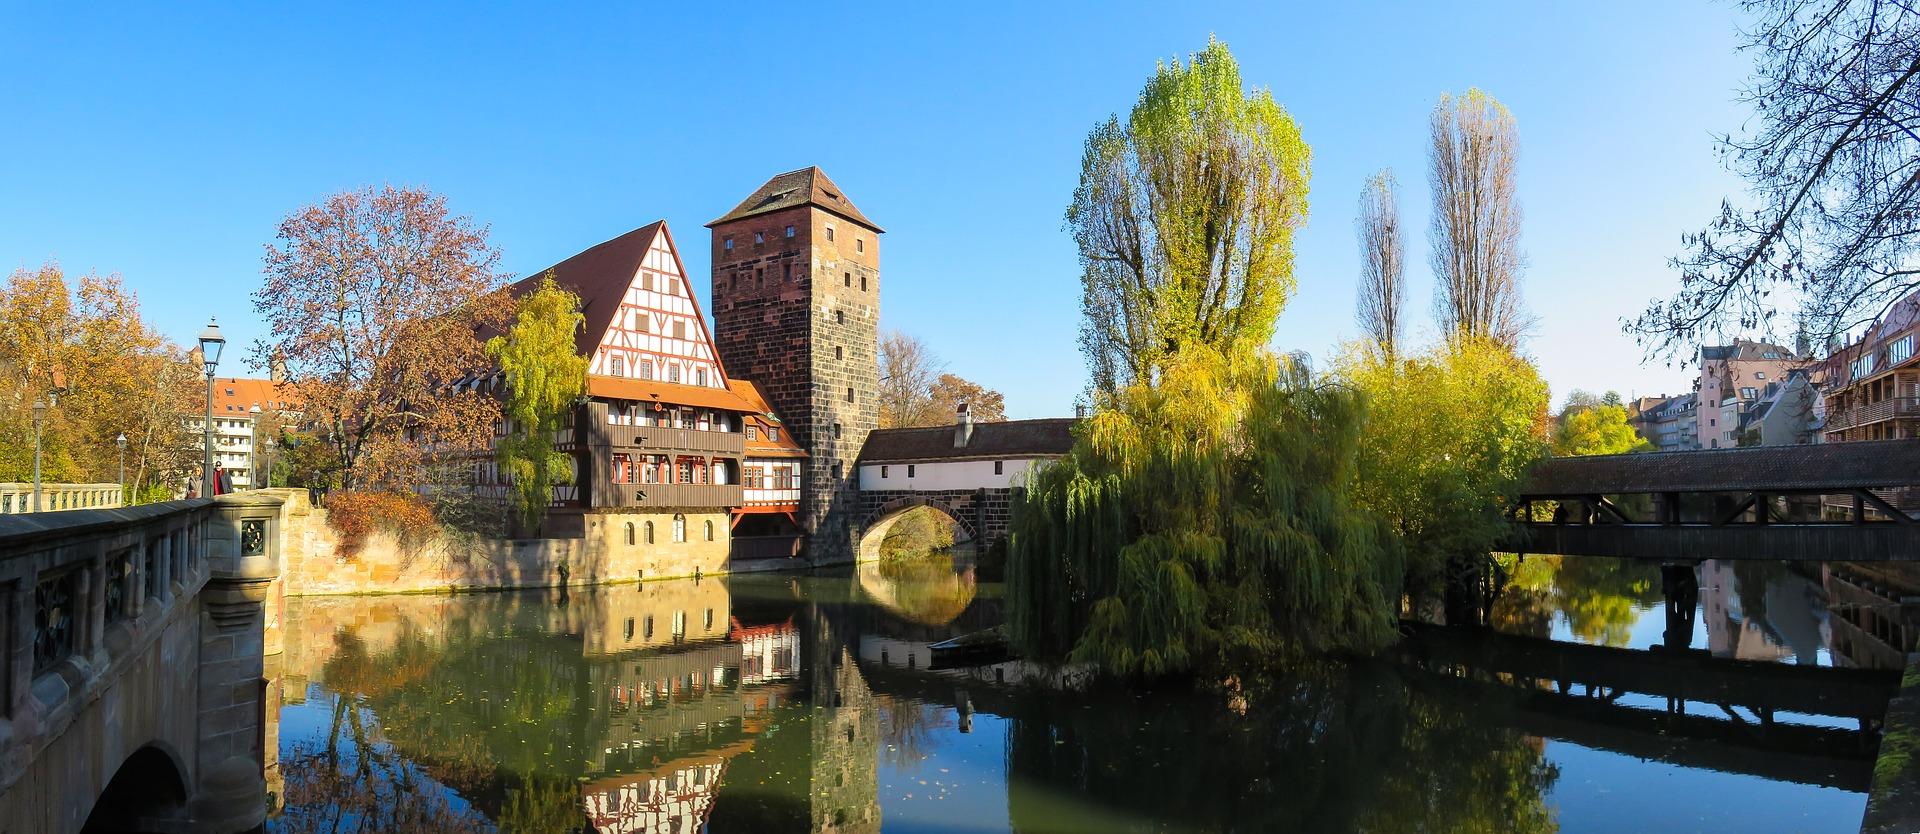 Bild: Nürnberg